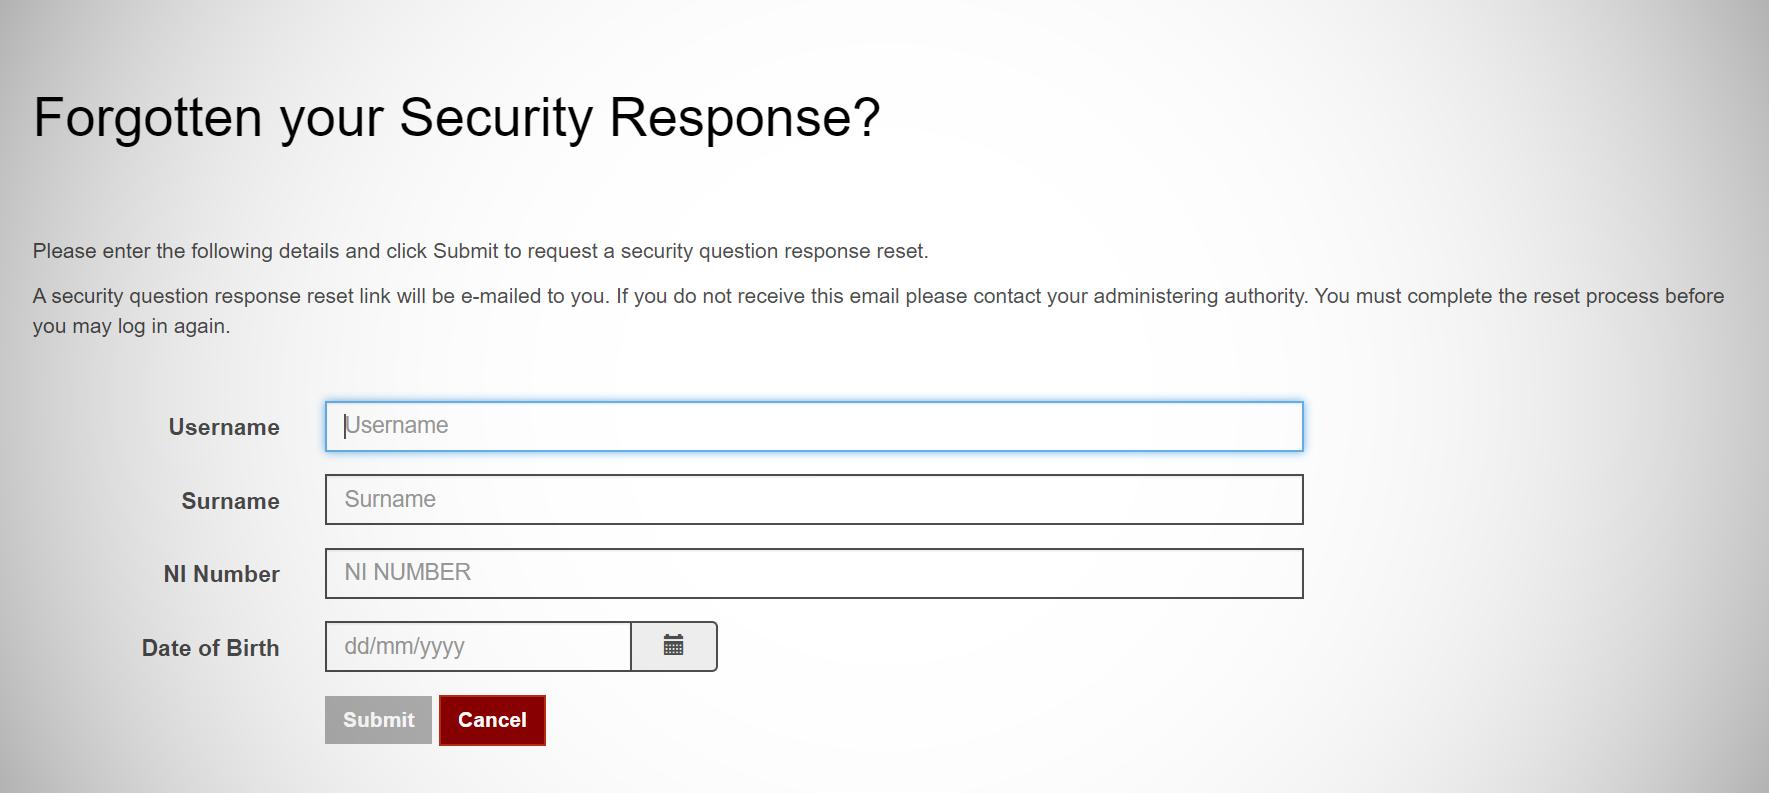 Security response screen capture